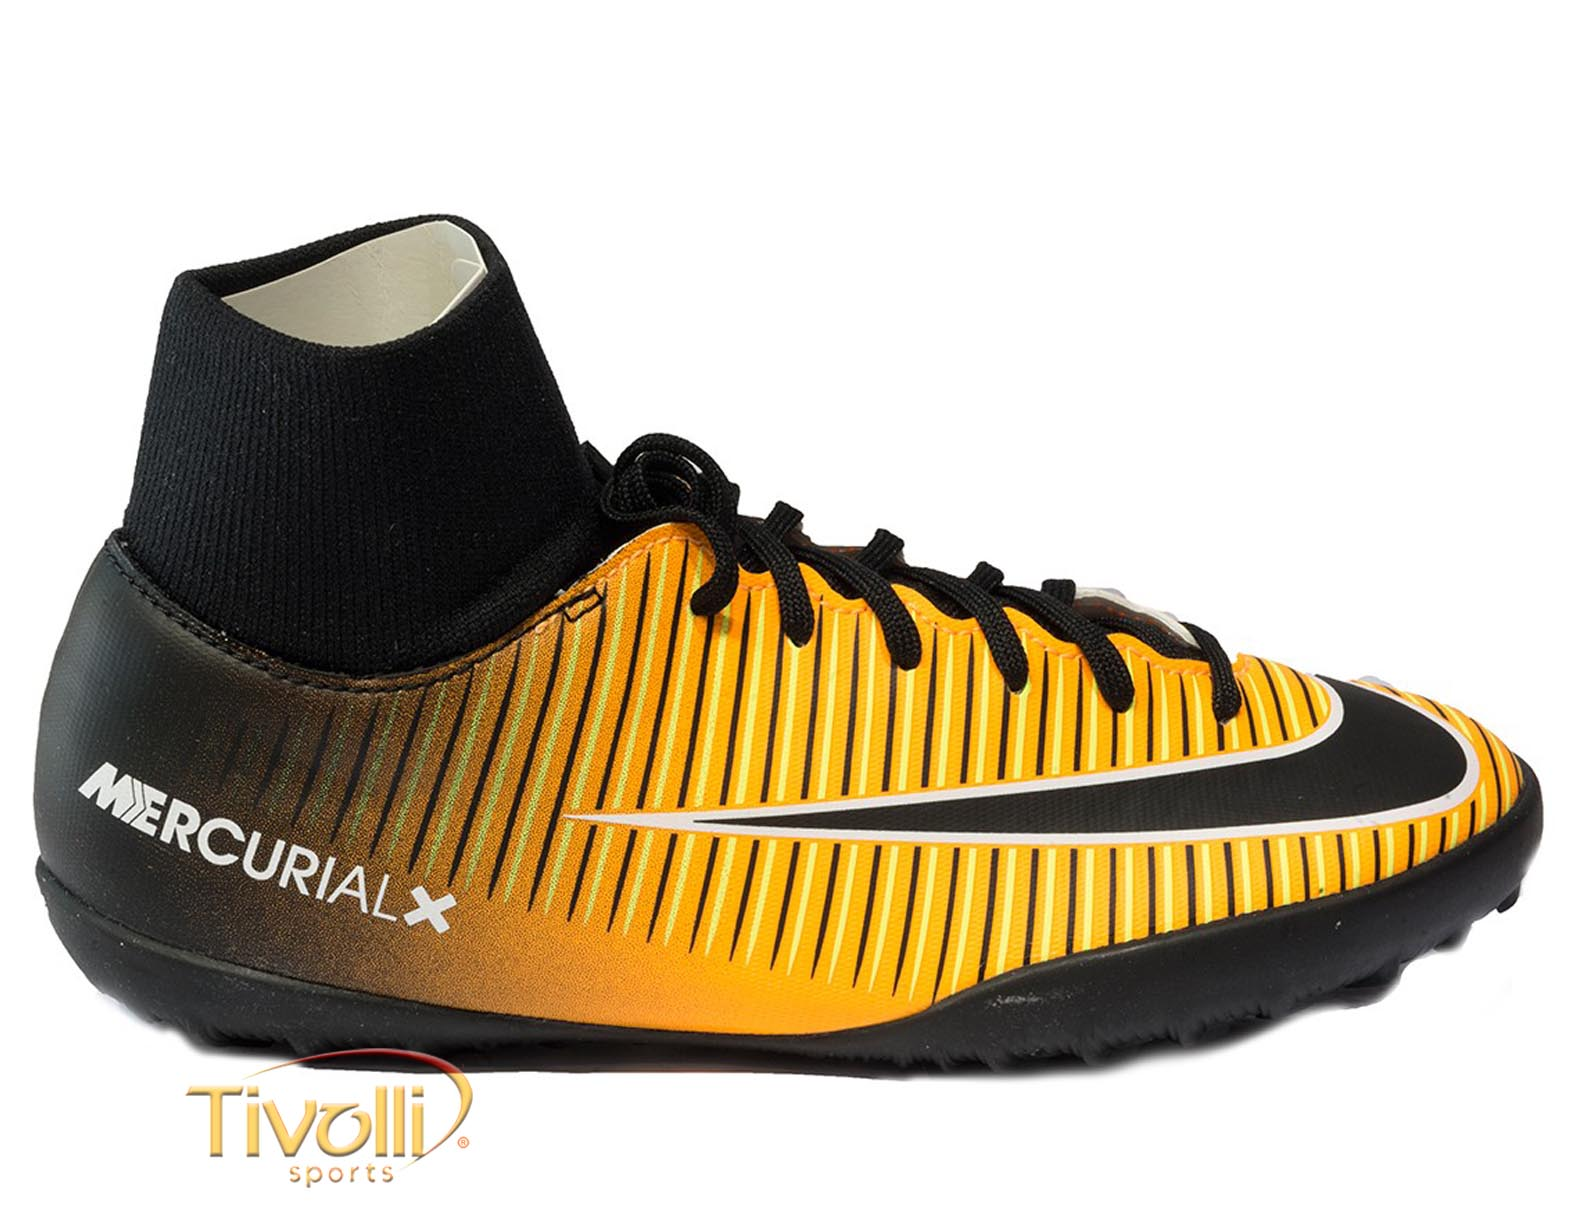 47c561ed1da1f Chuteira Nike JR. MercurialX Victory VI DF TF Society Infantil Preta